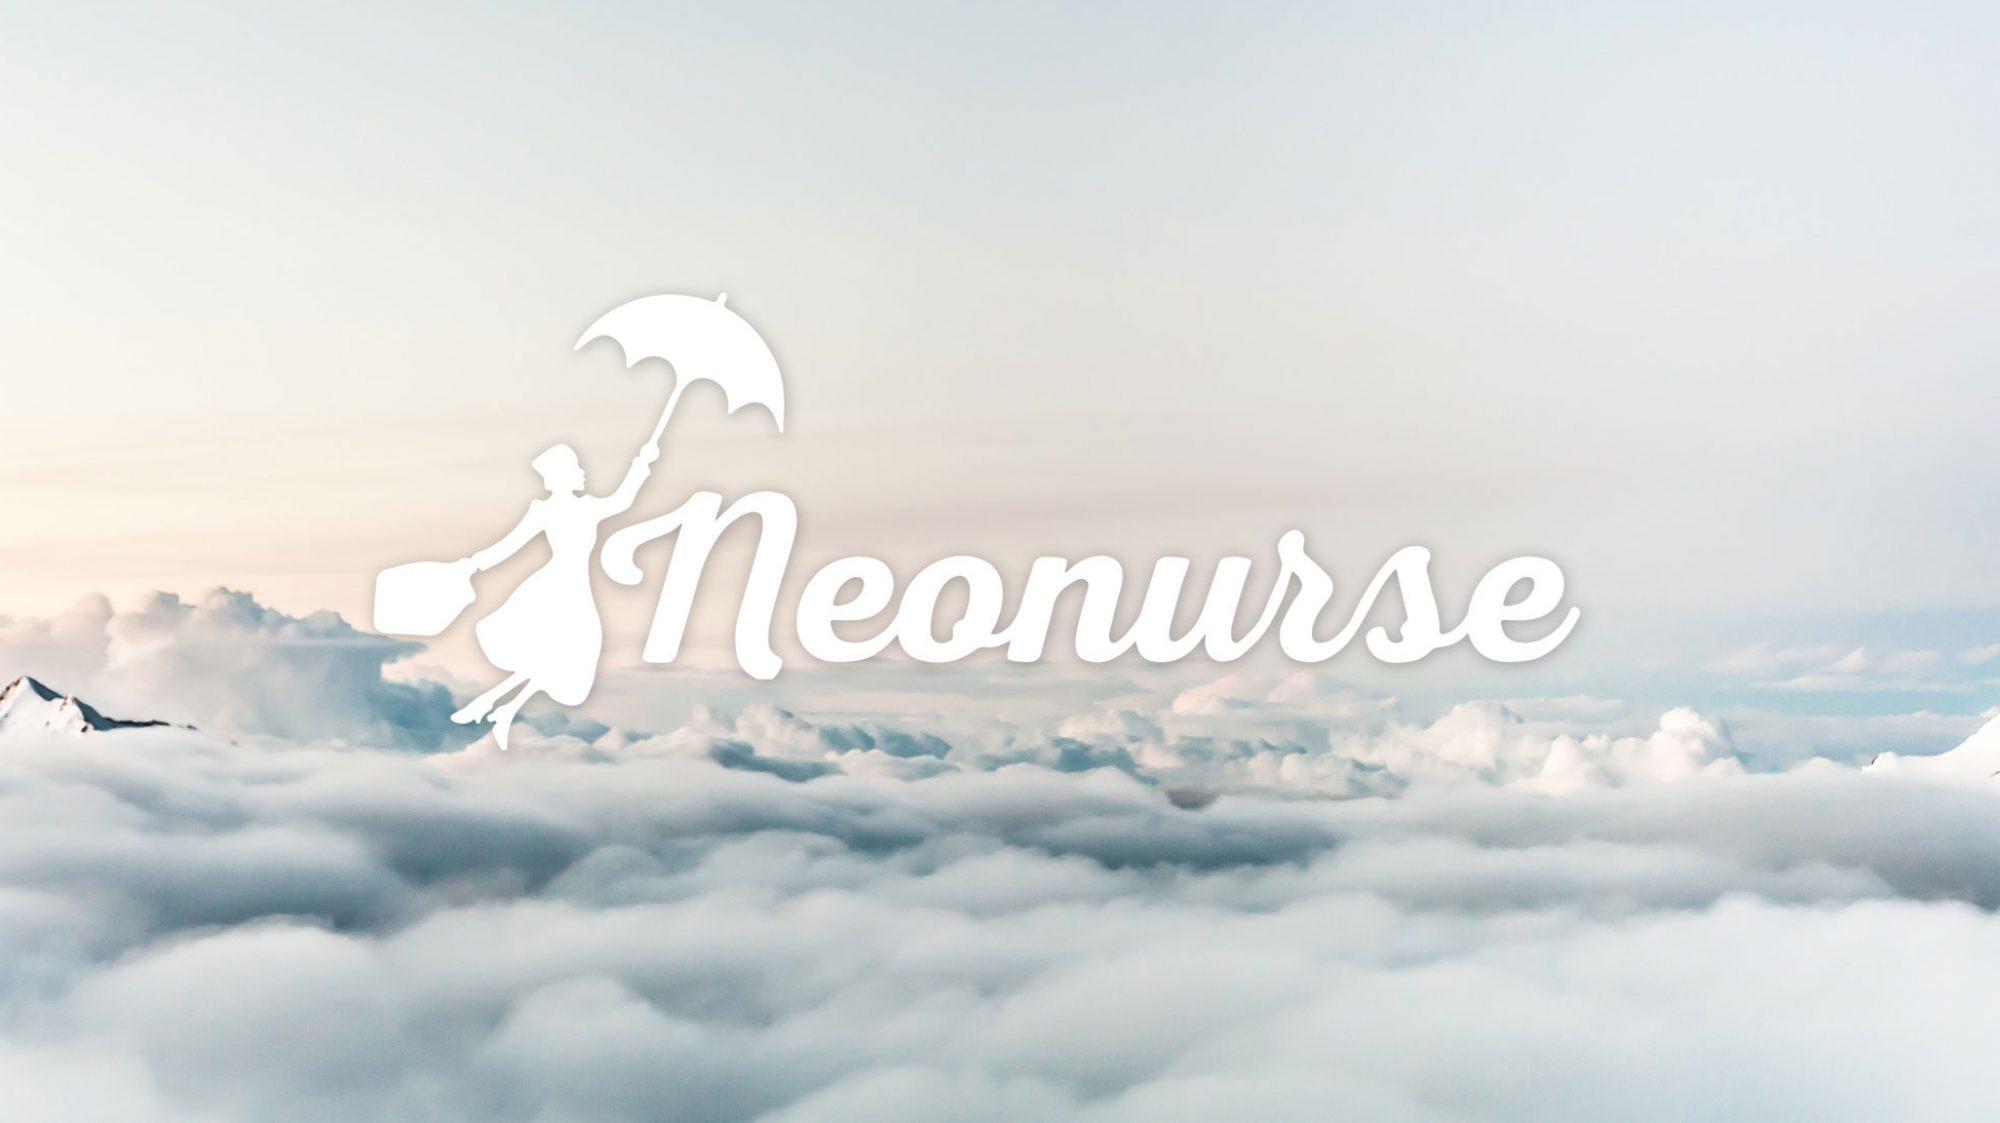 Neonurse